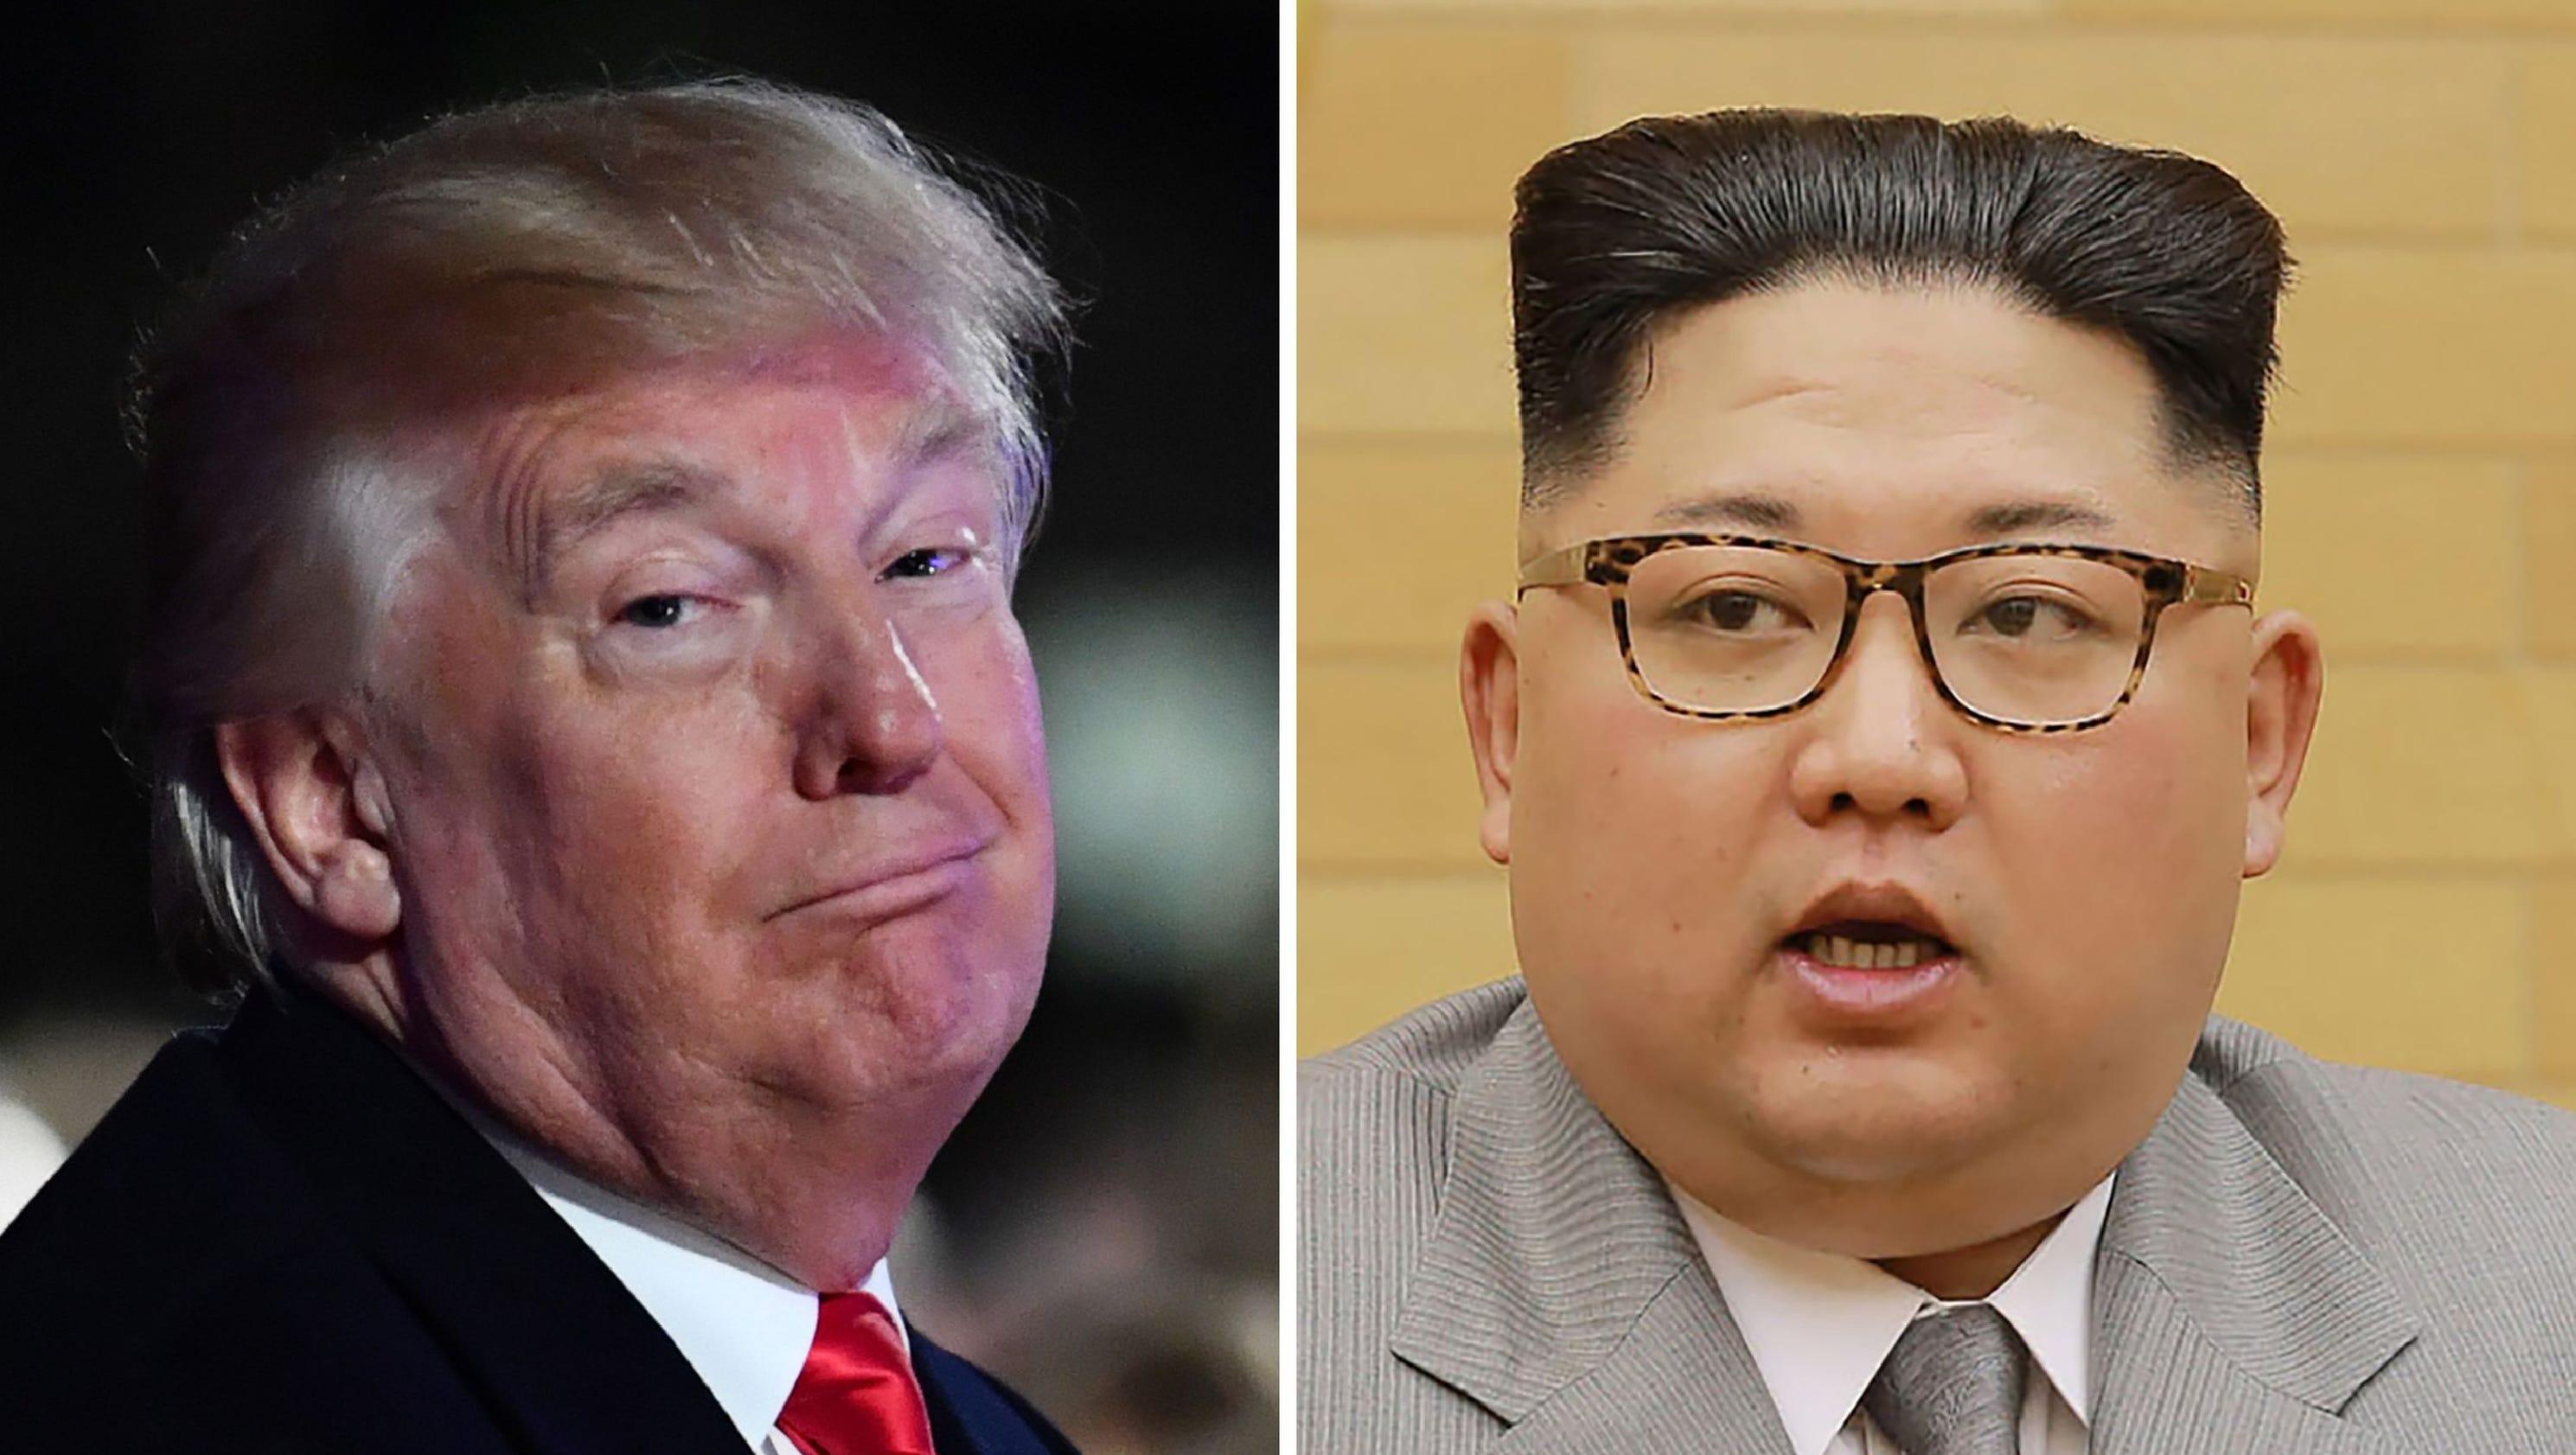 Donald Trump ponders North Korean threat to cancel Singapore summit with Kim Jong Un